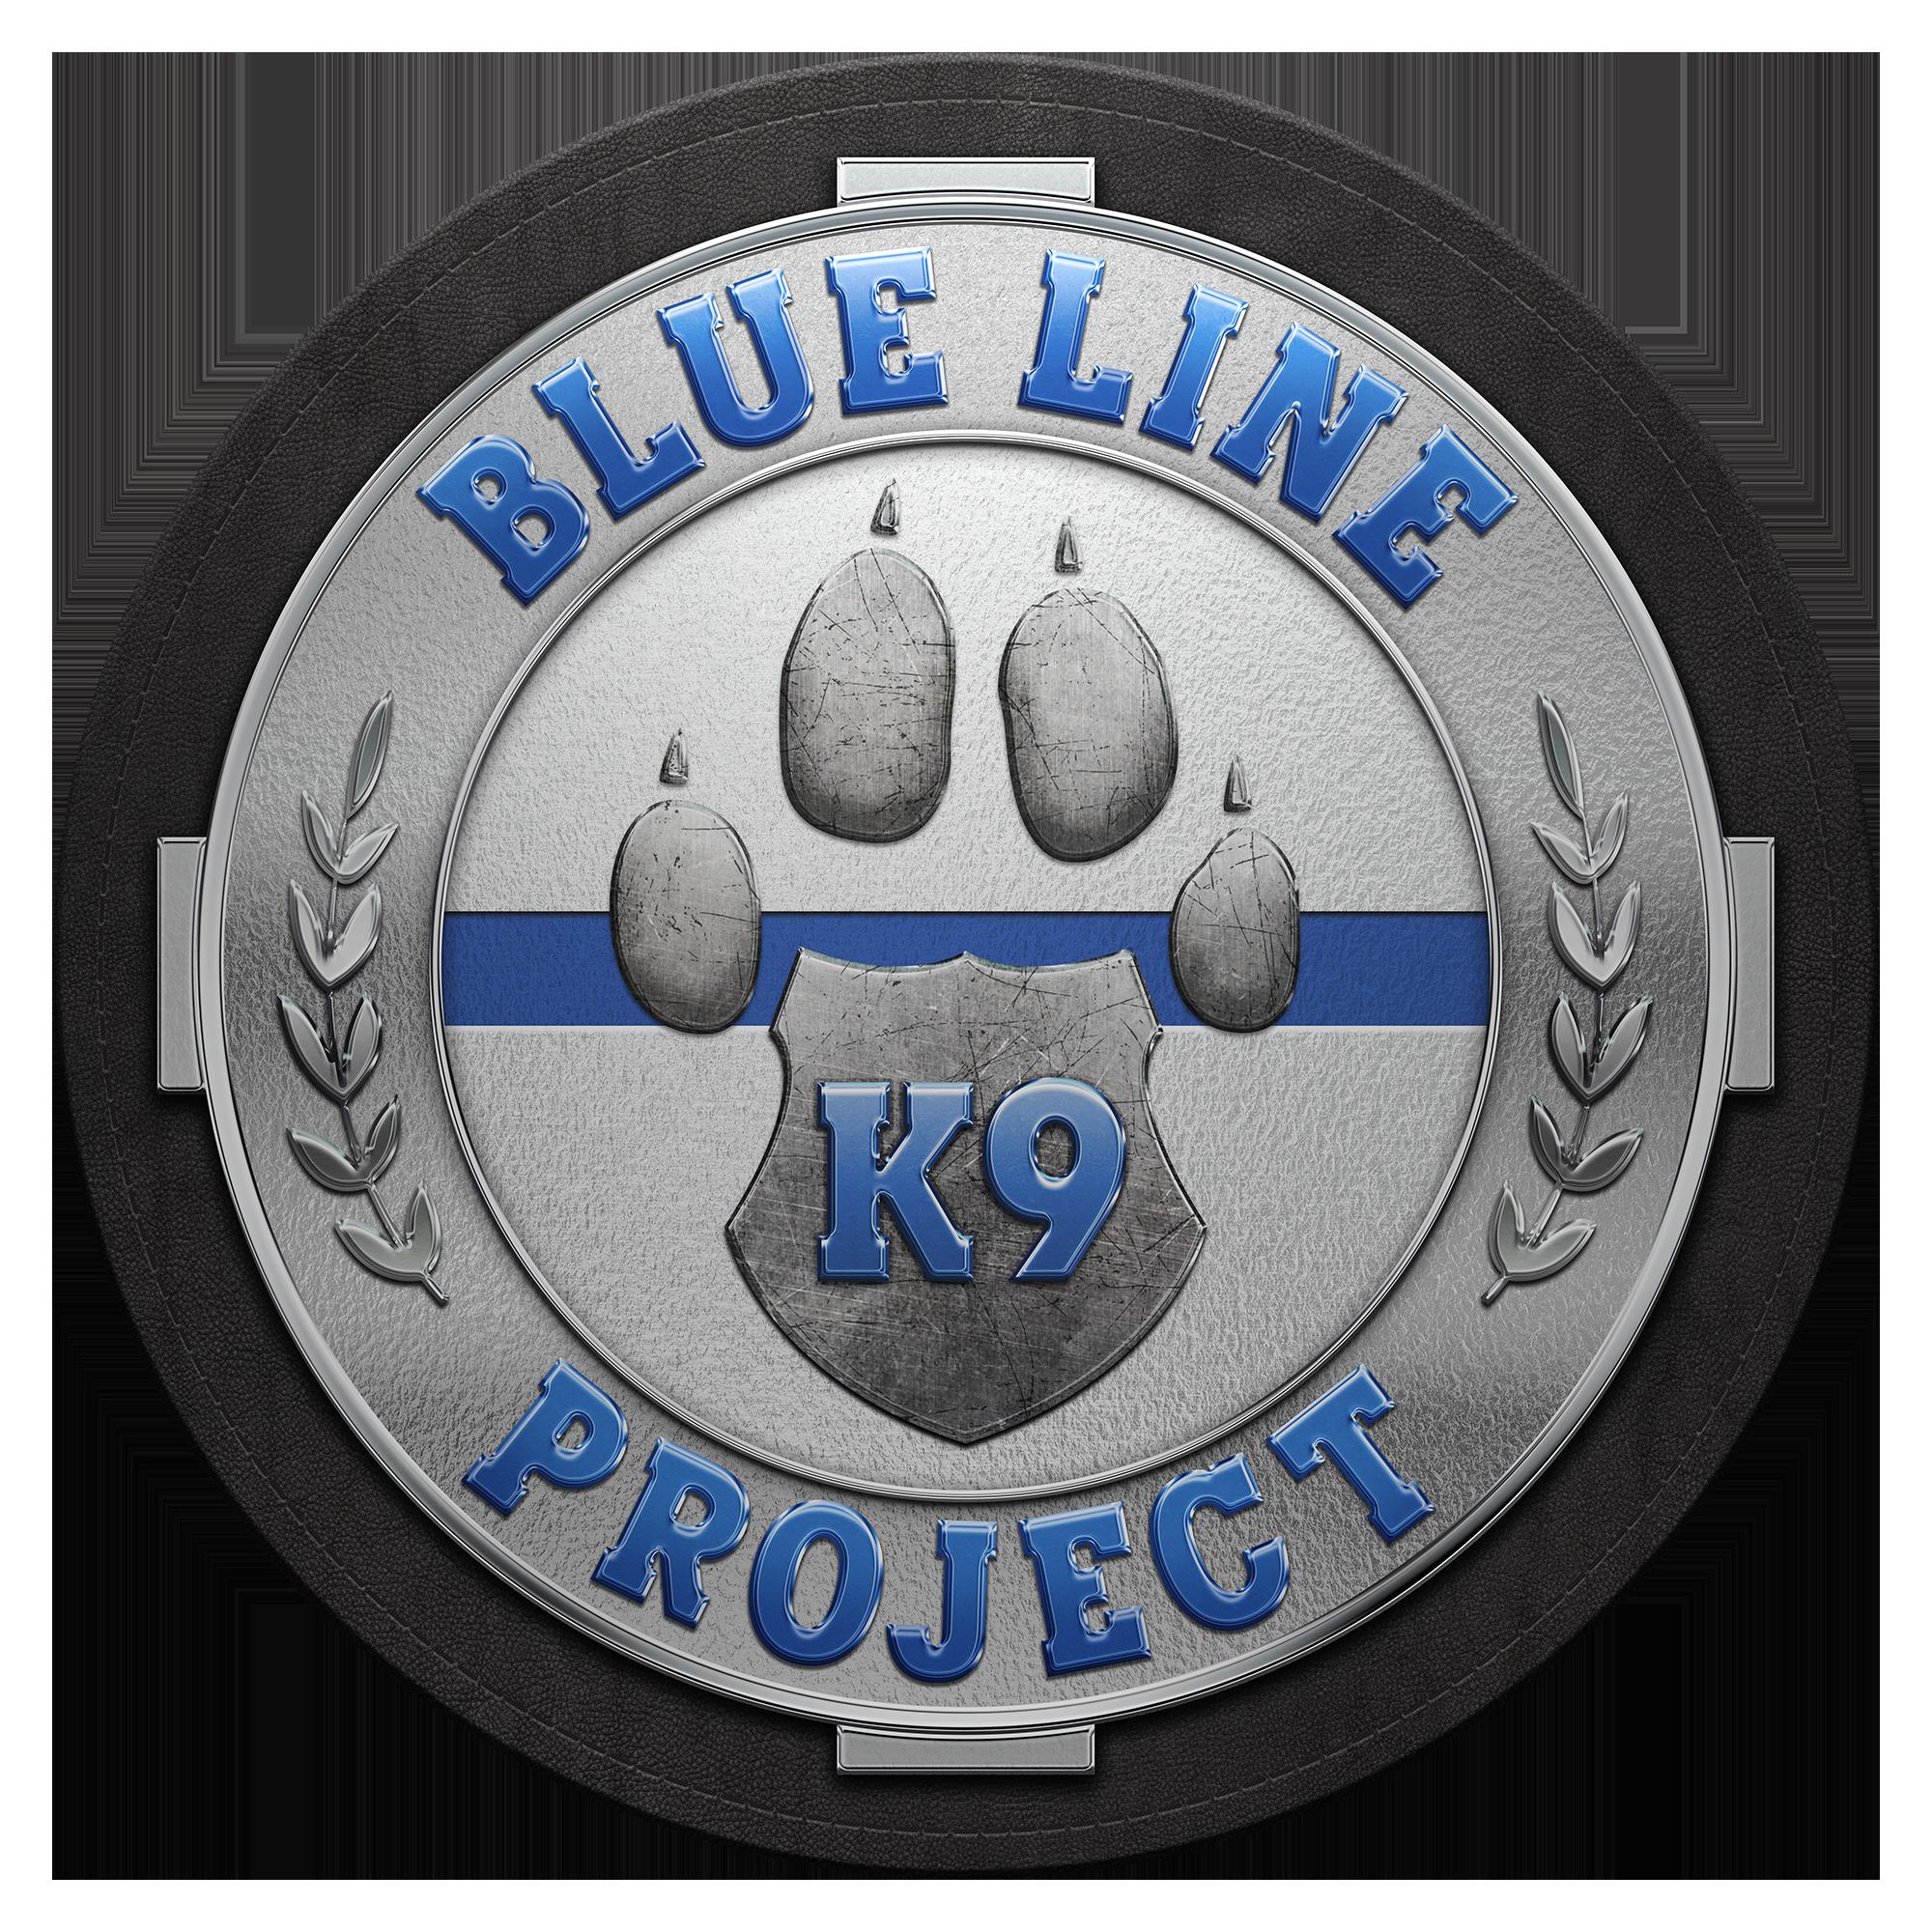 Blue Line K9 Project